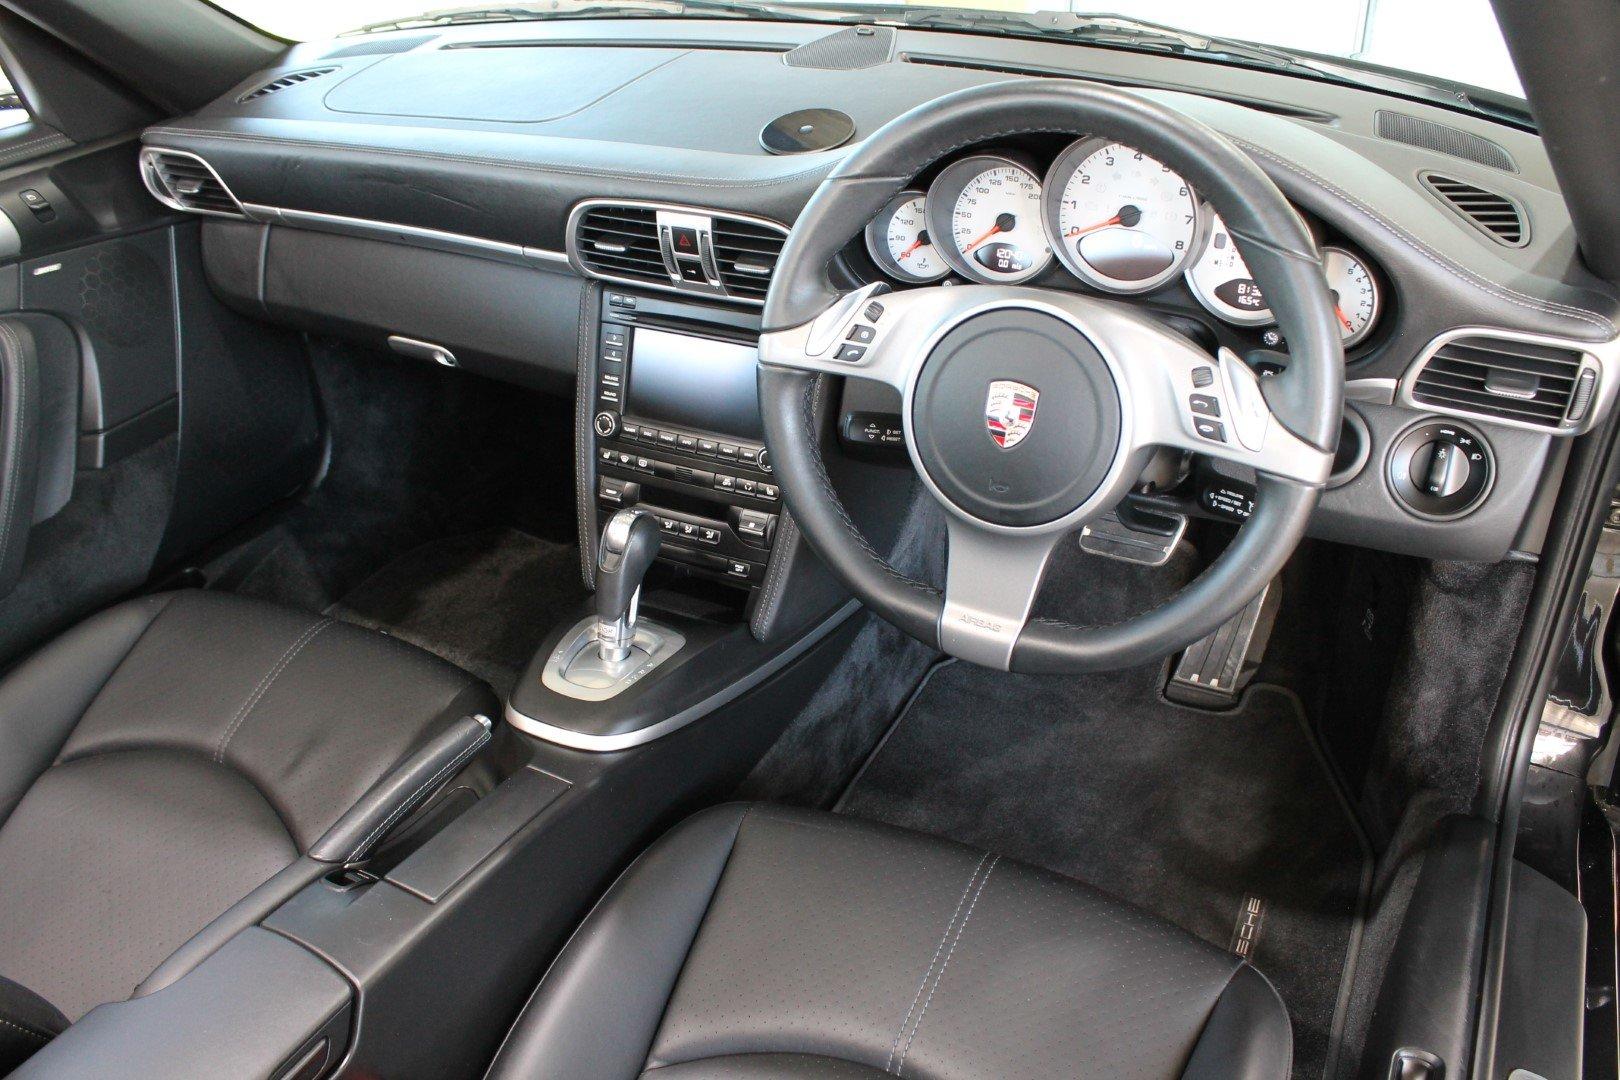 2009 Porsche 911 (997) 3.8 C4S PDK Cabriolet For Sale (picture 5 of 6)